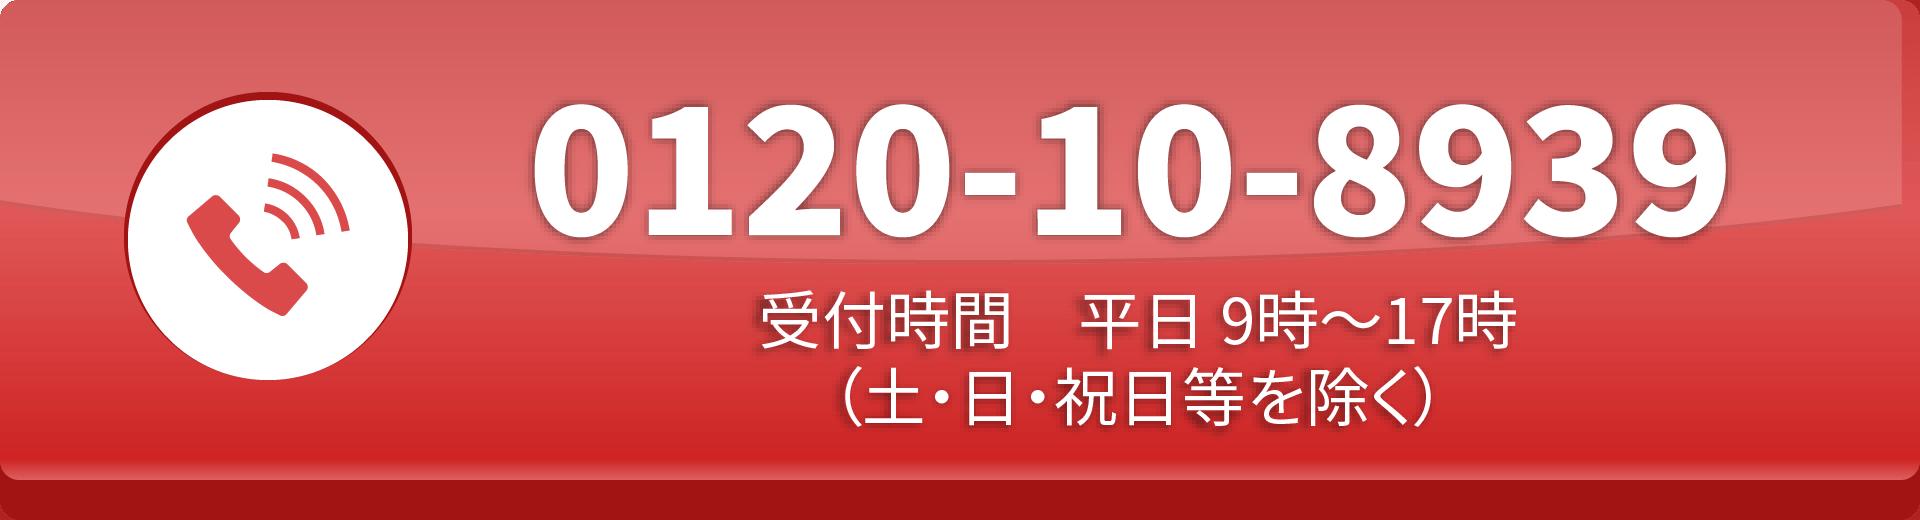 0120-10-8939